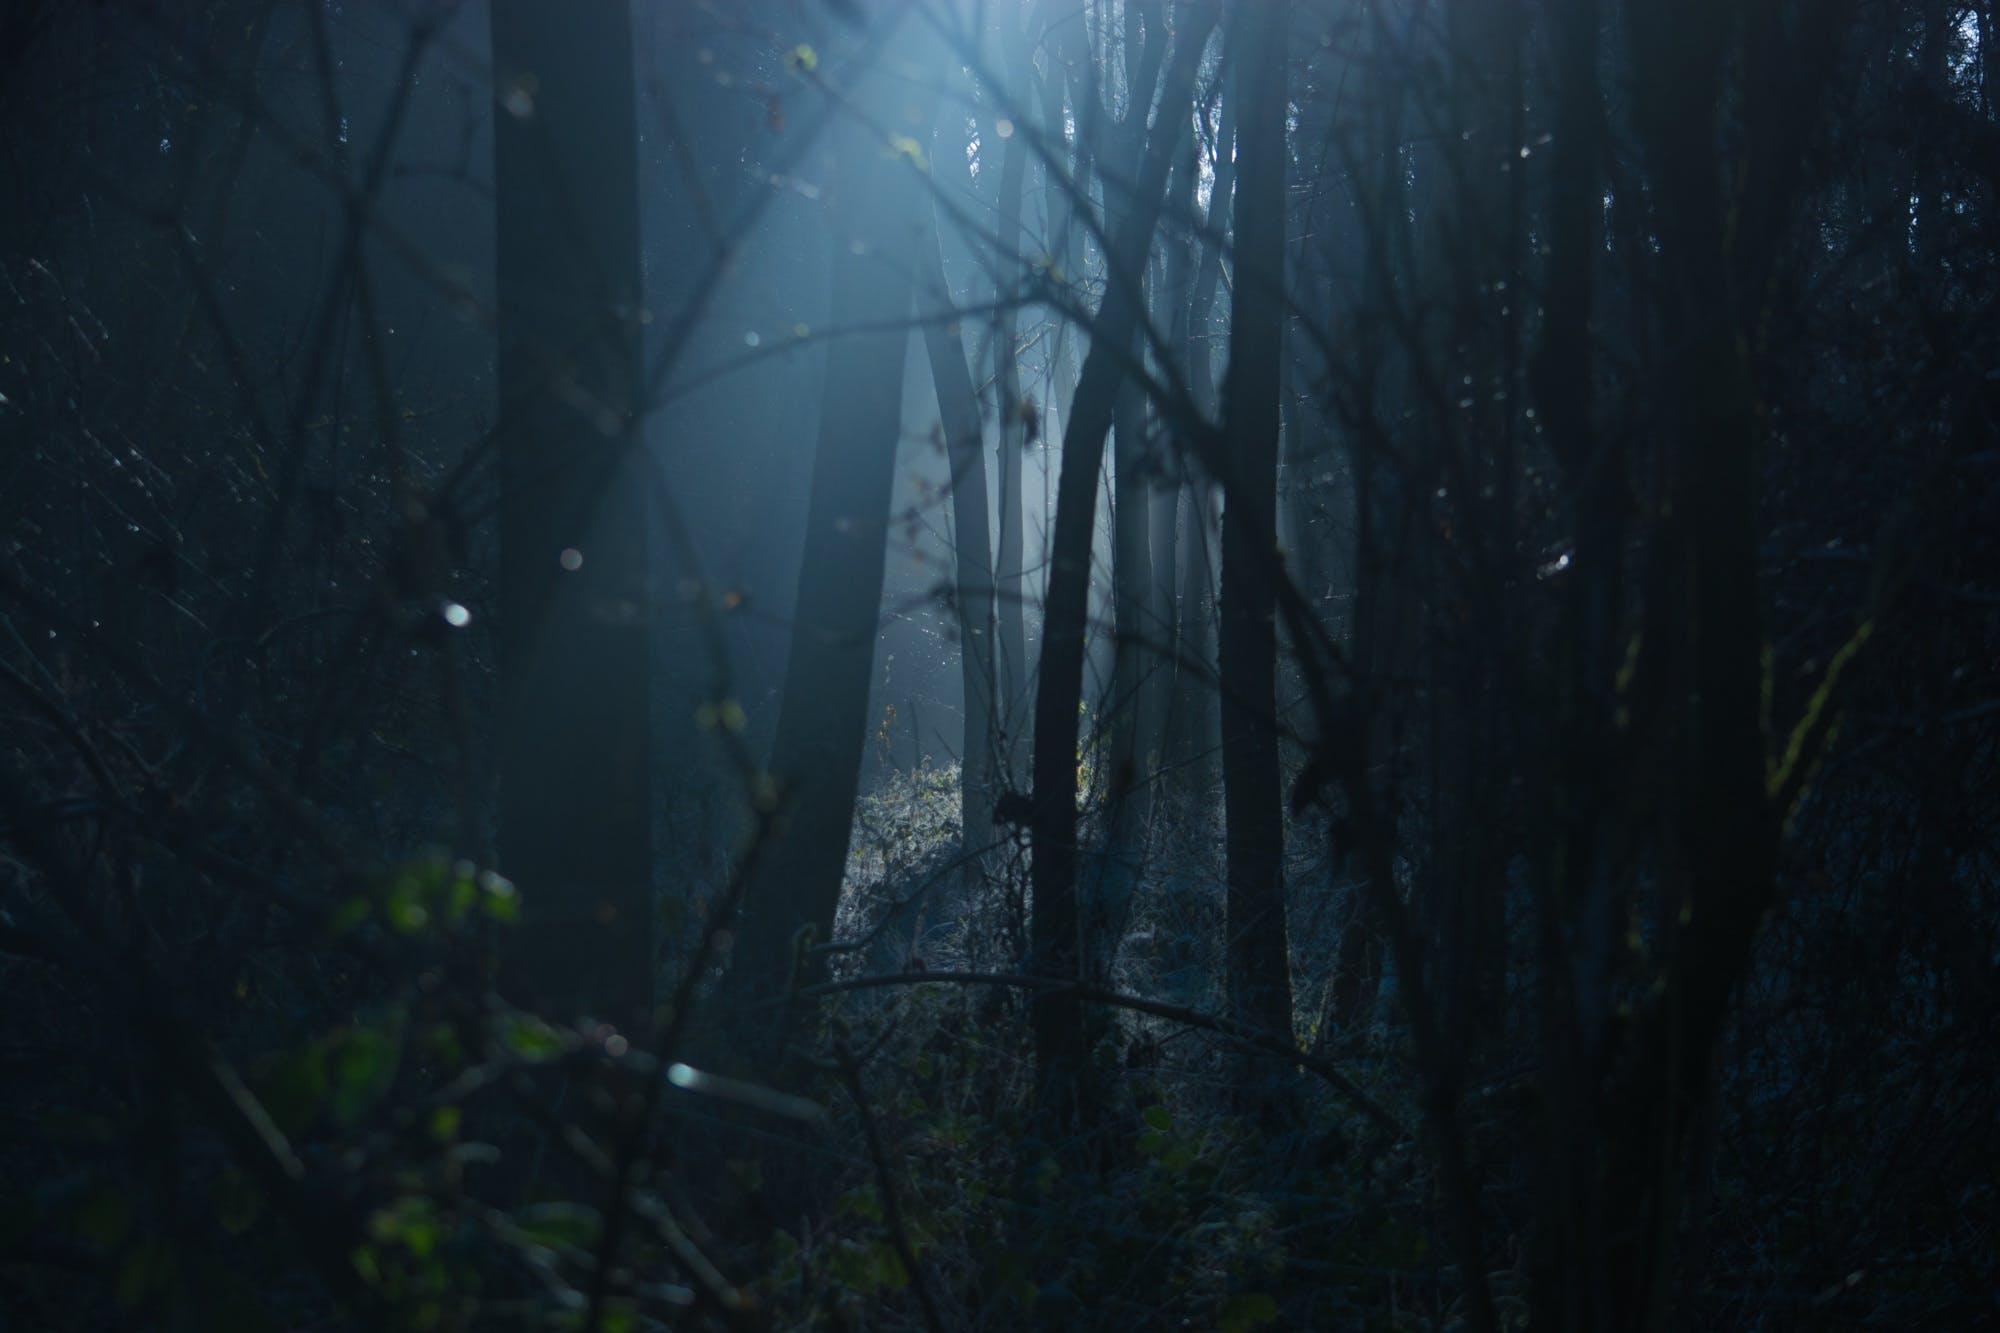 backlit, creepy, dark